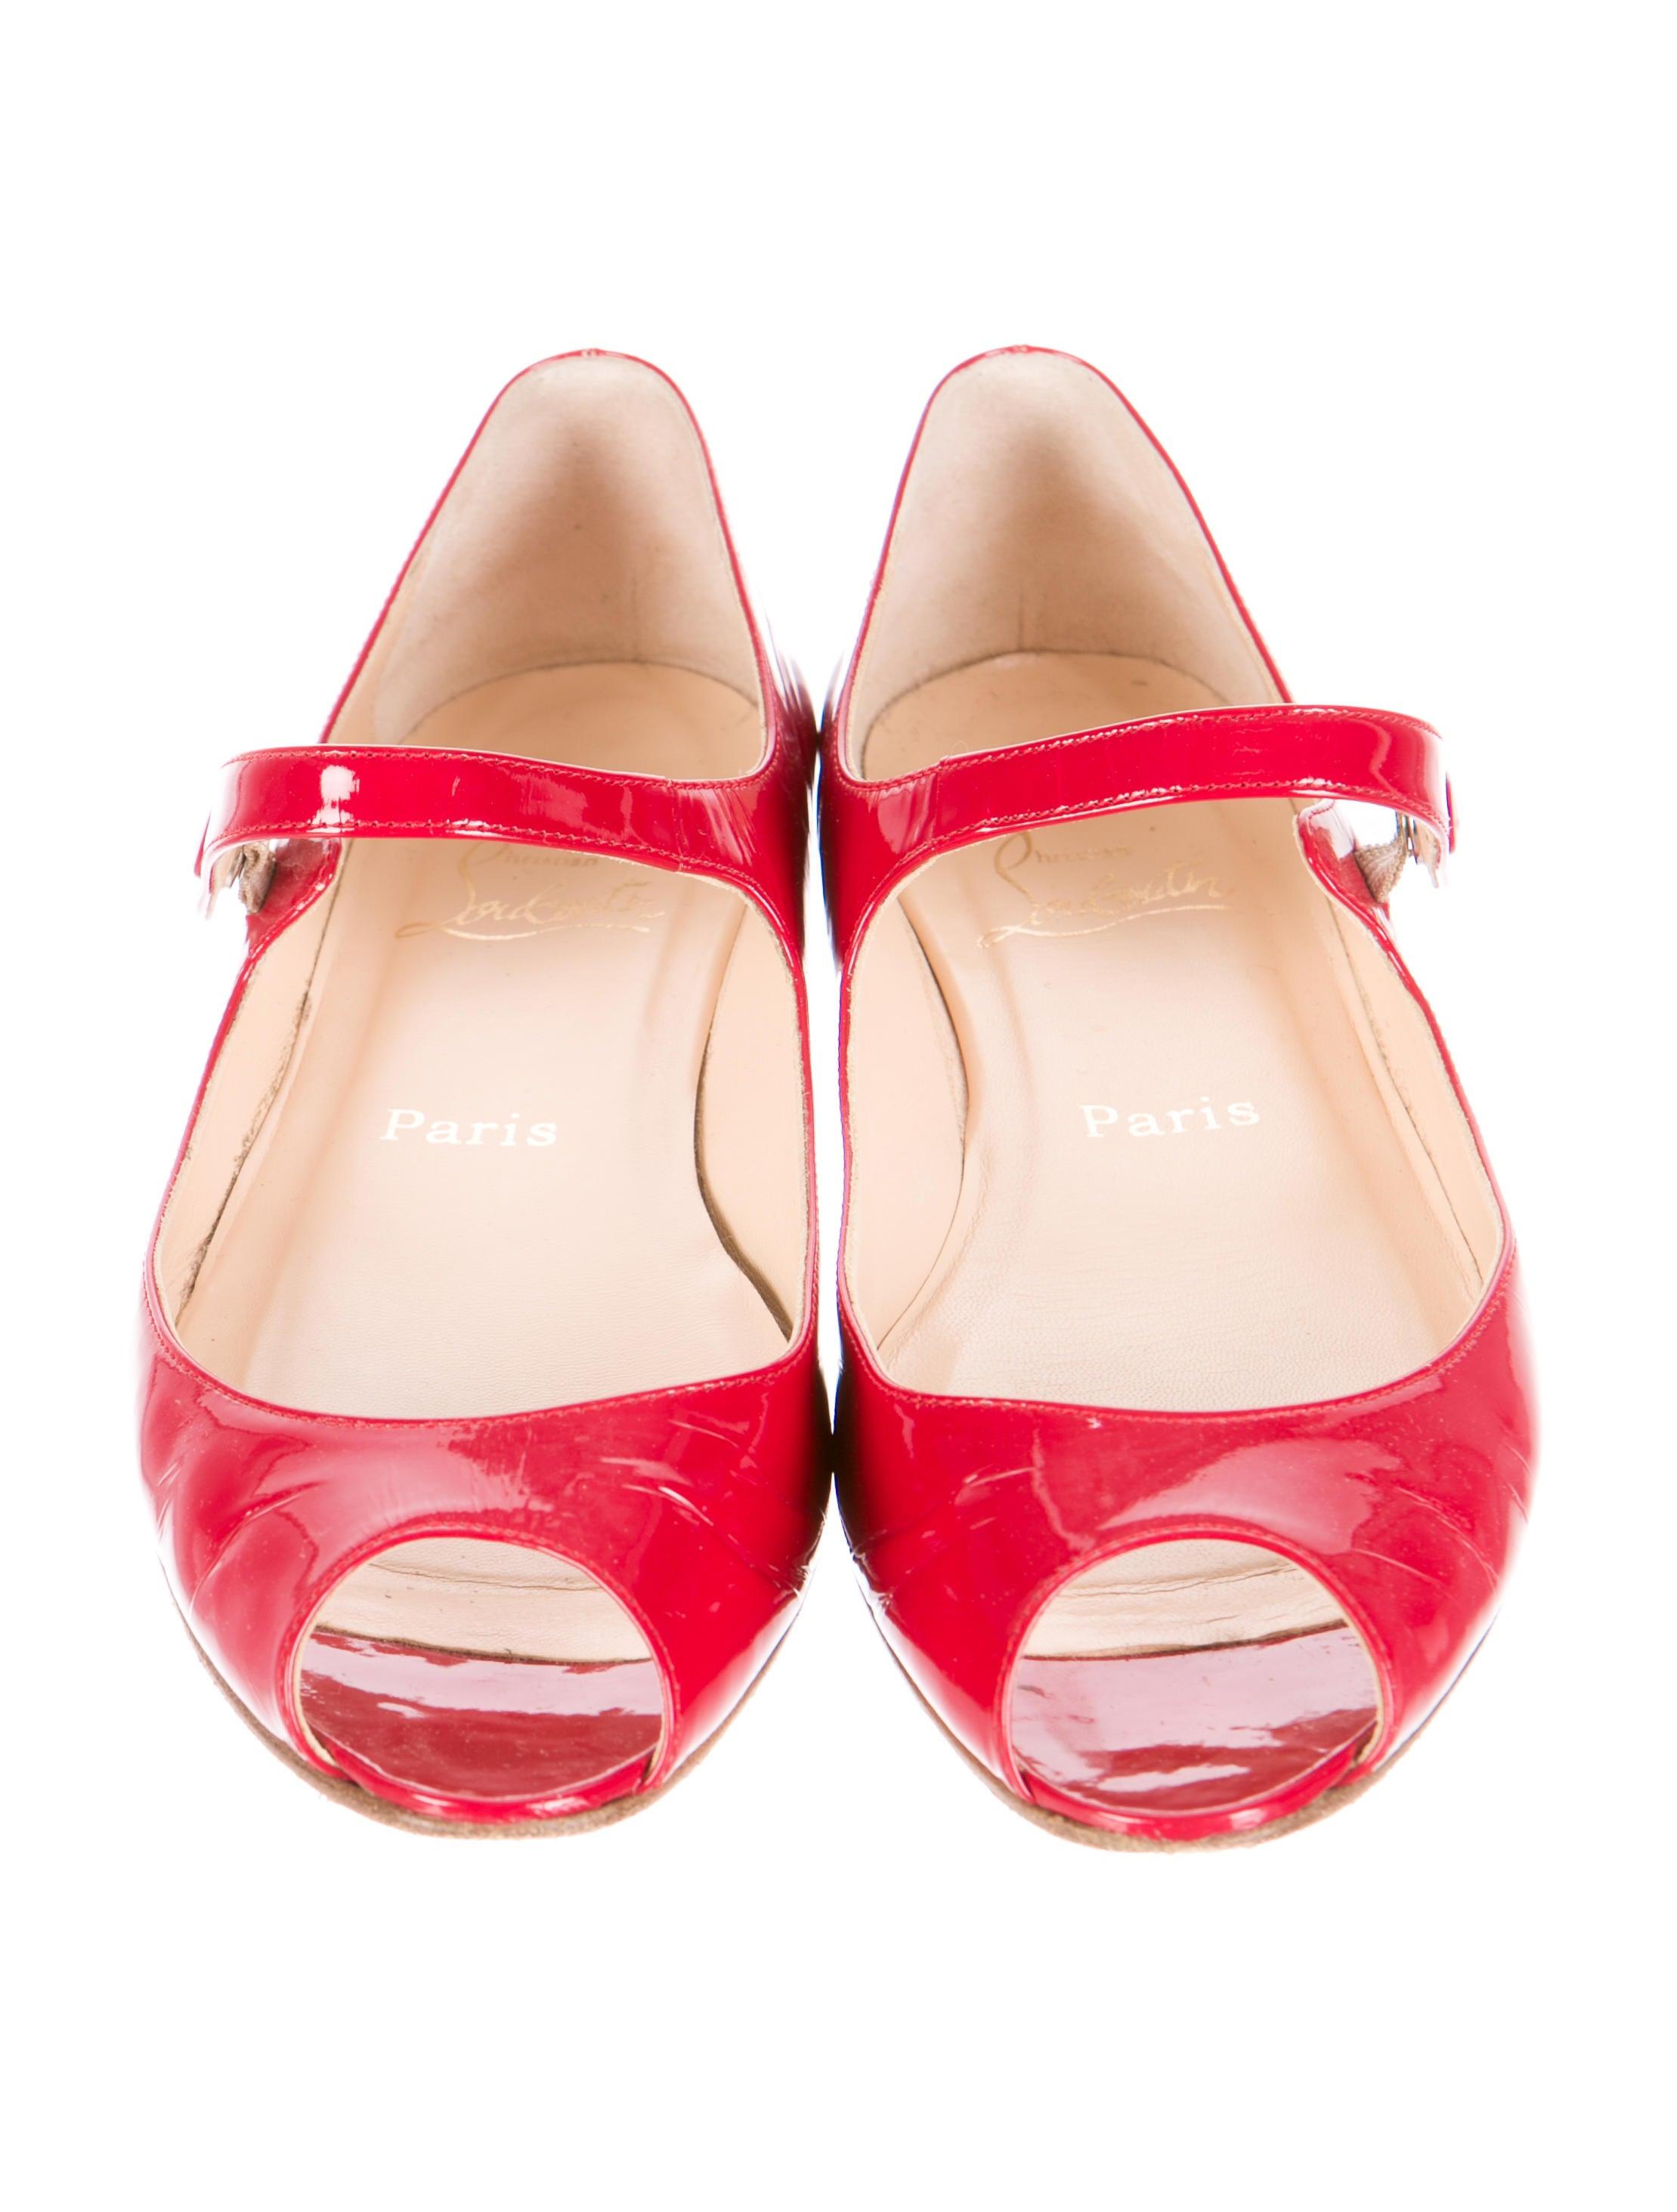 louboutin knock offs - Christian Louboutin Peep-Toe Iowa Flats - Shoes - CHT43892 | The ...